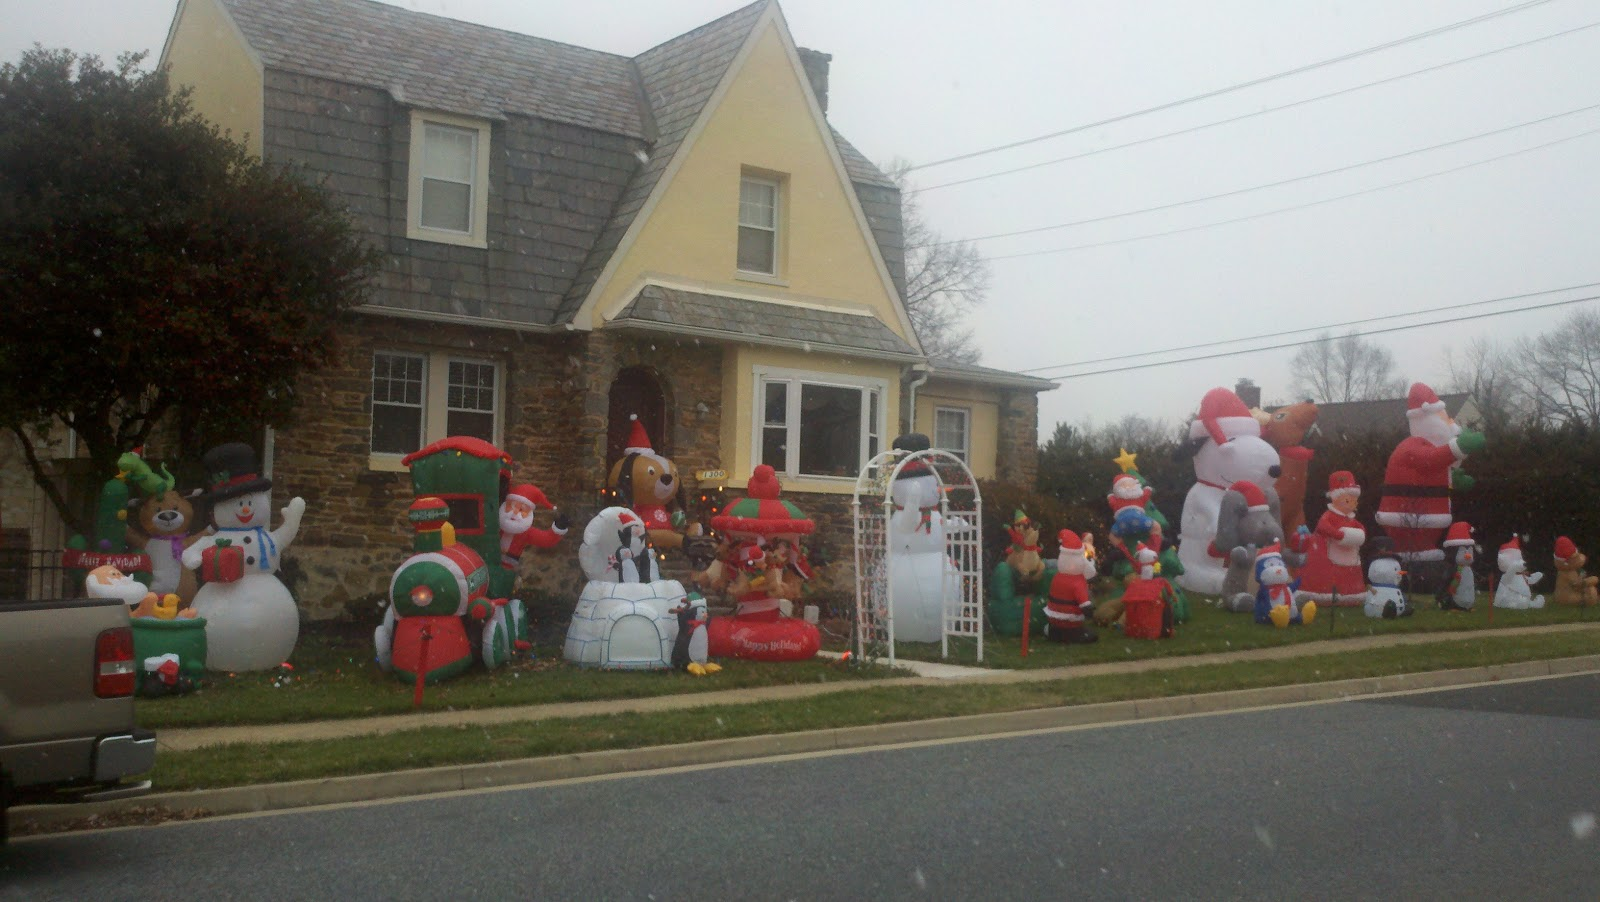 maxs redneck christmas - Redneck Christmas